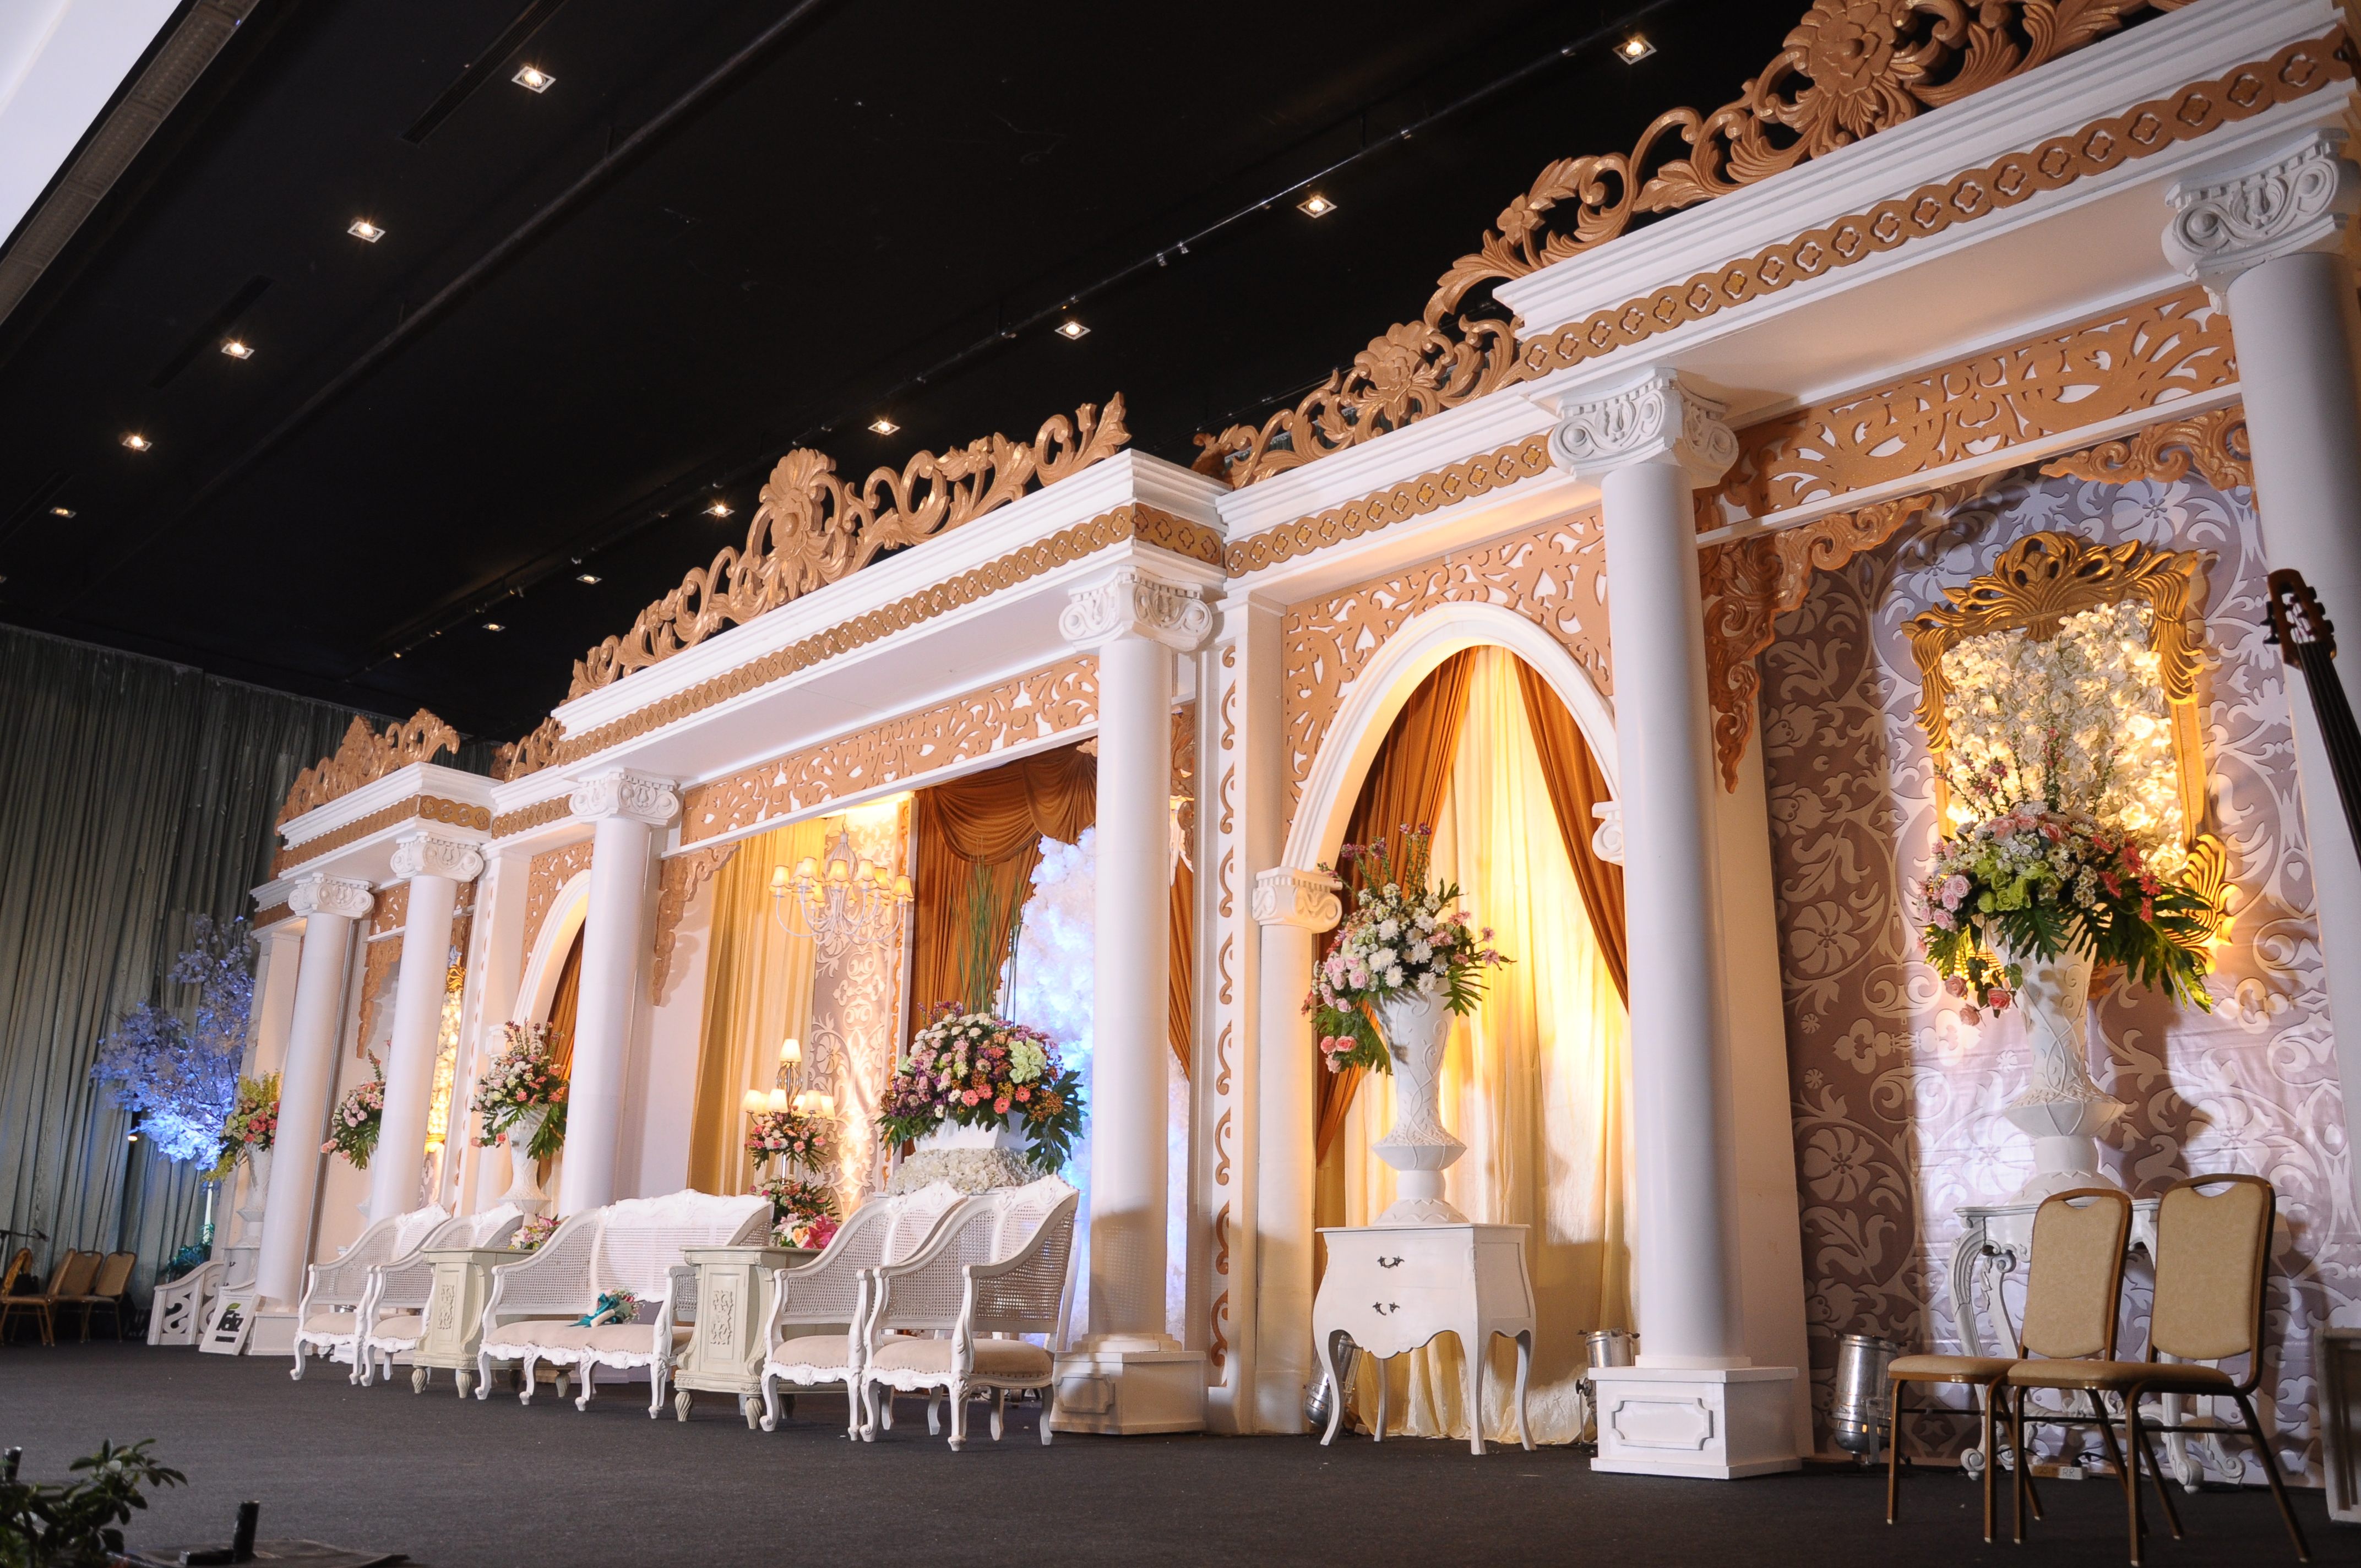 Pasundan palace lussy taufan by ghaisaniyara wedding pasundan palace lussy taufan by ghaisaniyara wedding bridestory junglespirit Gallery